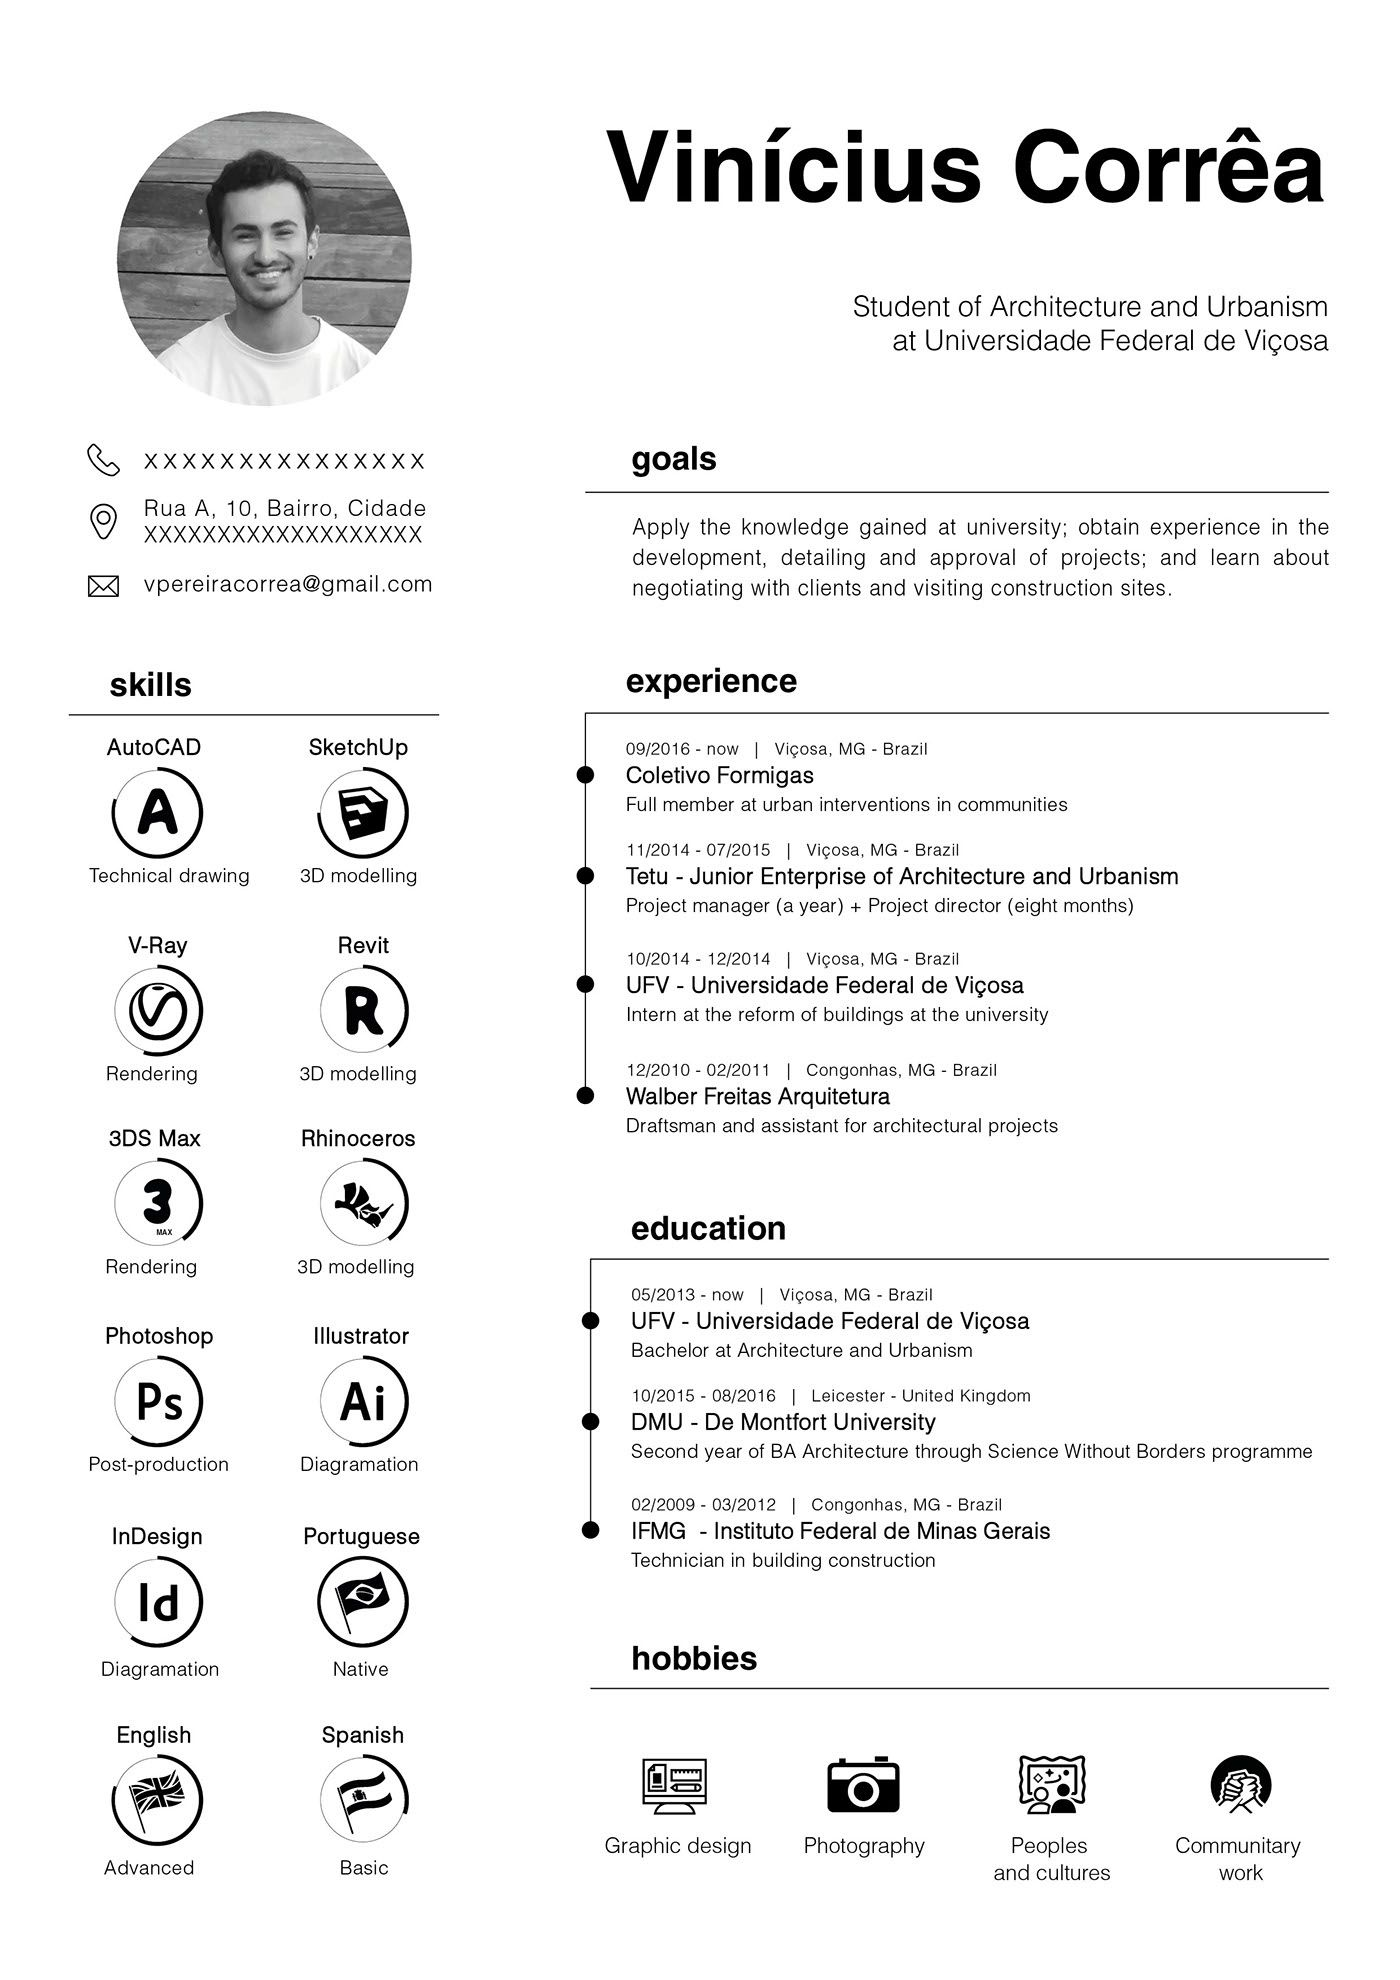 CV Resumé | Vinícius Corrêa